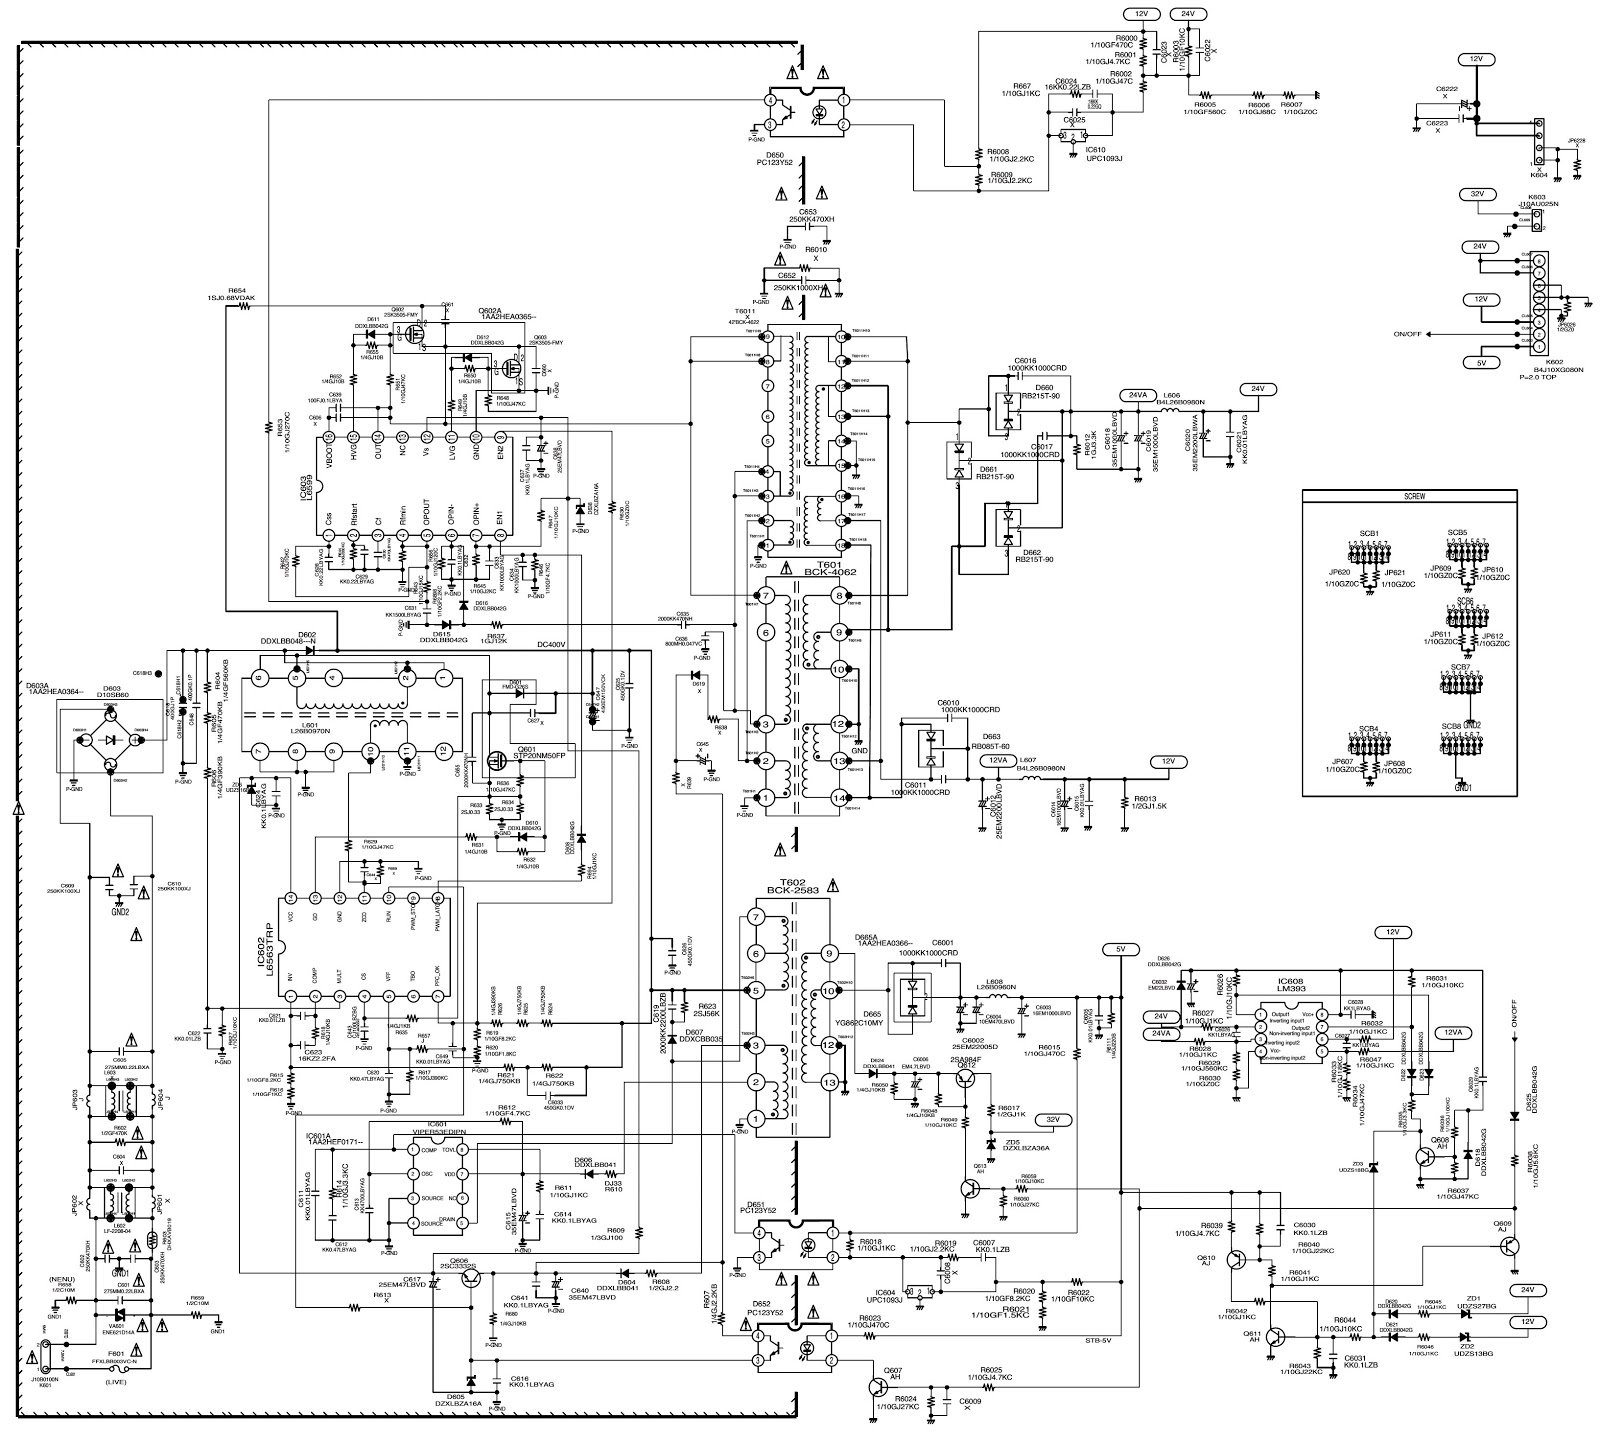 wiring diagram for samsung sound bar